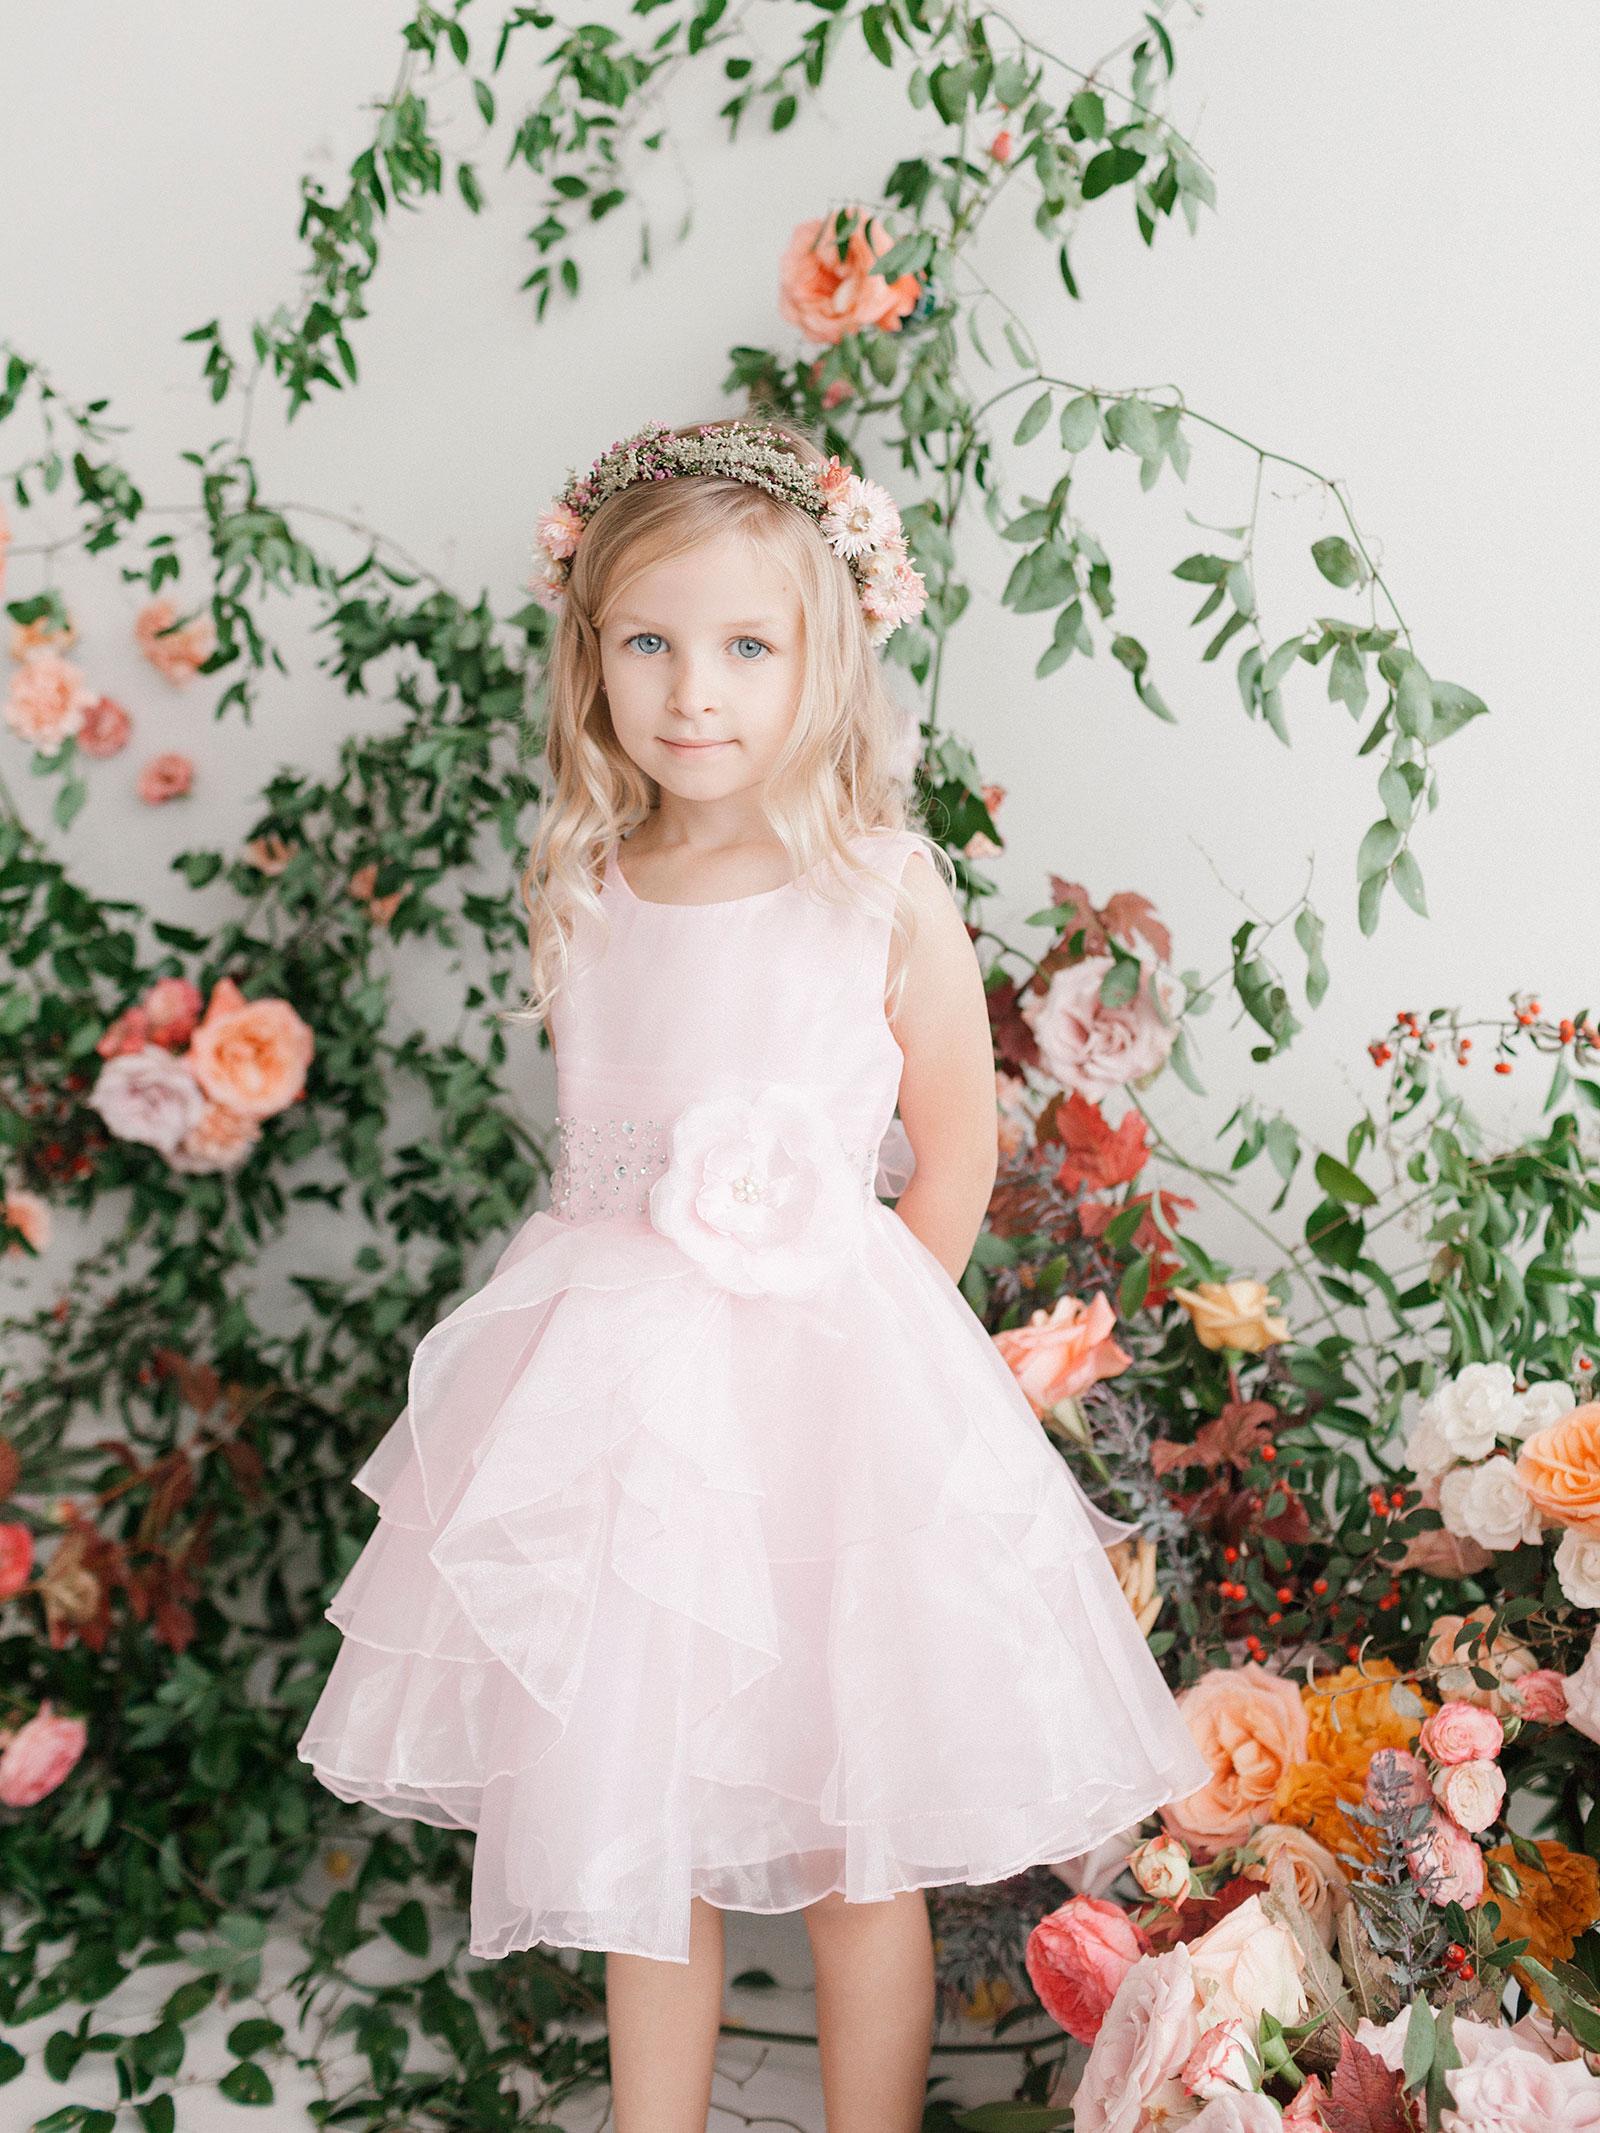 TT 5701BP Girls Dress Style 5701 BLUSH PINK Crystal Beaded Organza Dress